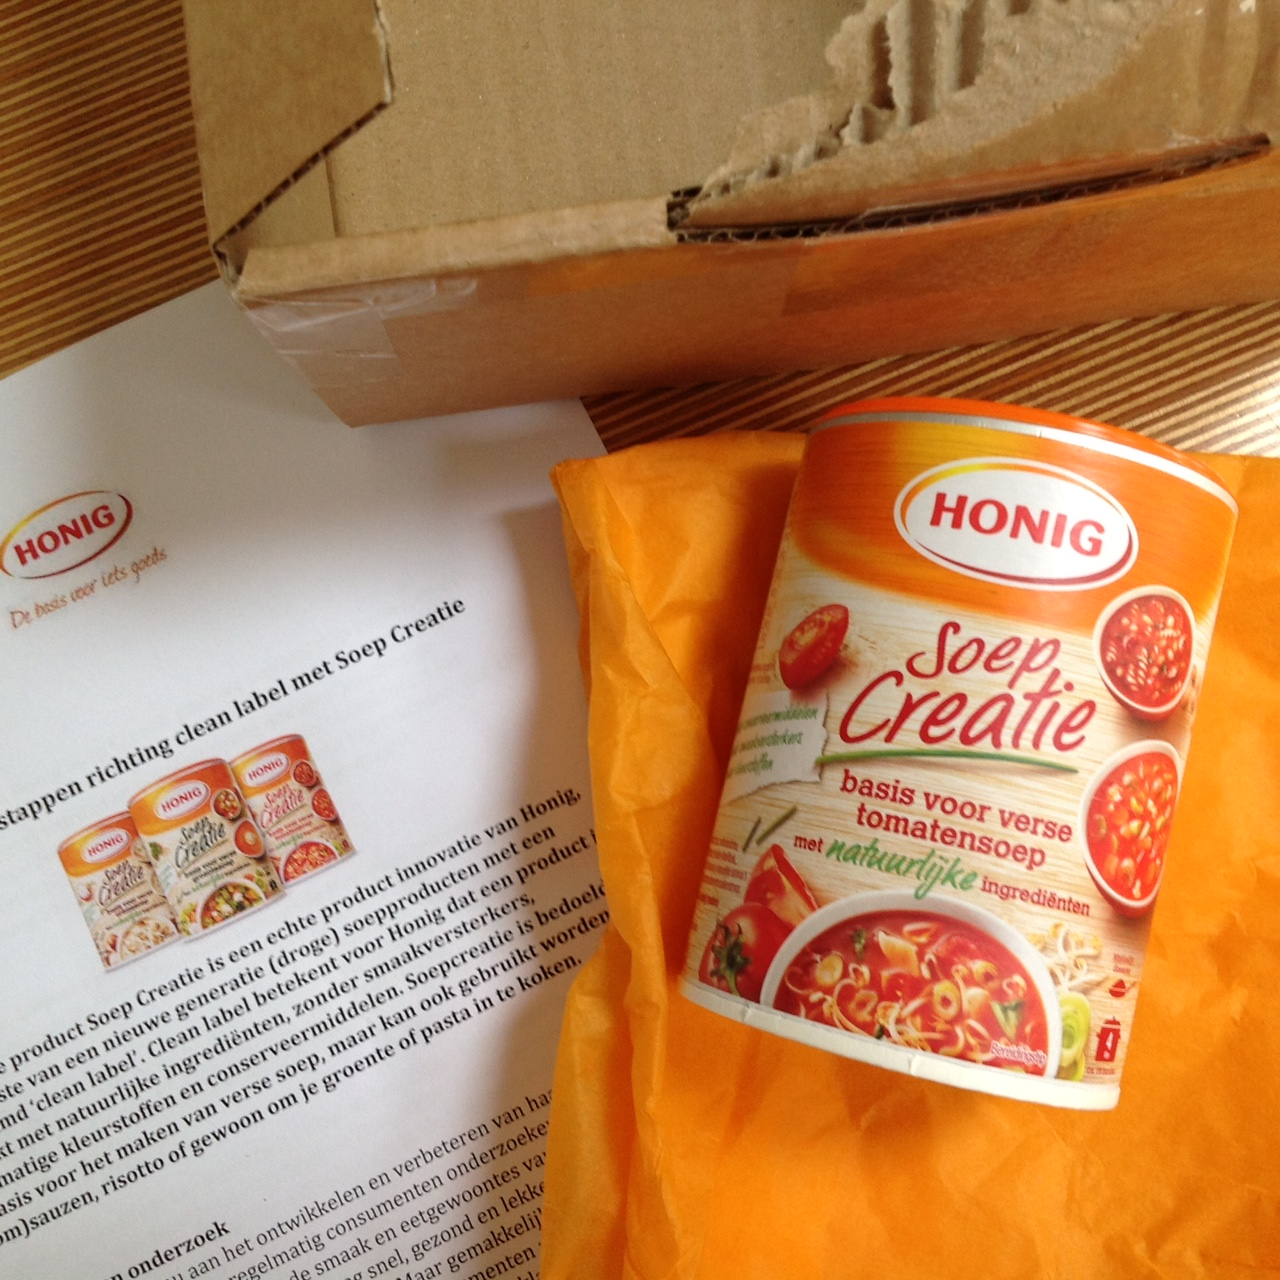 honig-soep-creatie